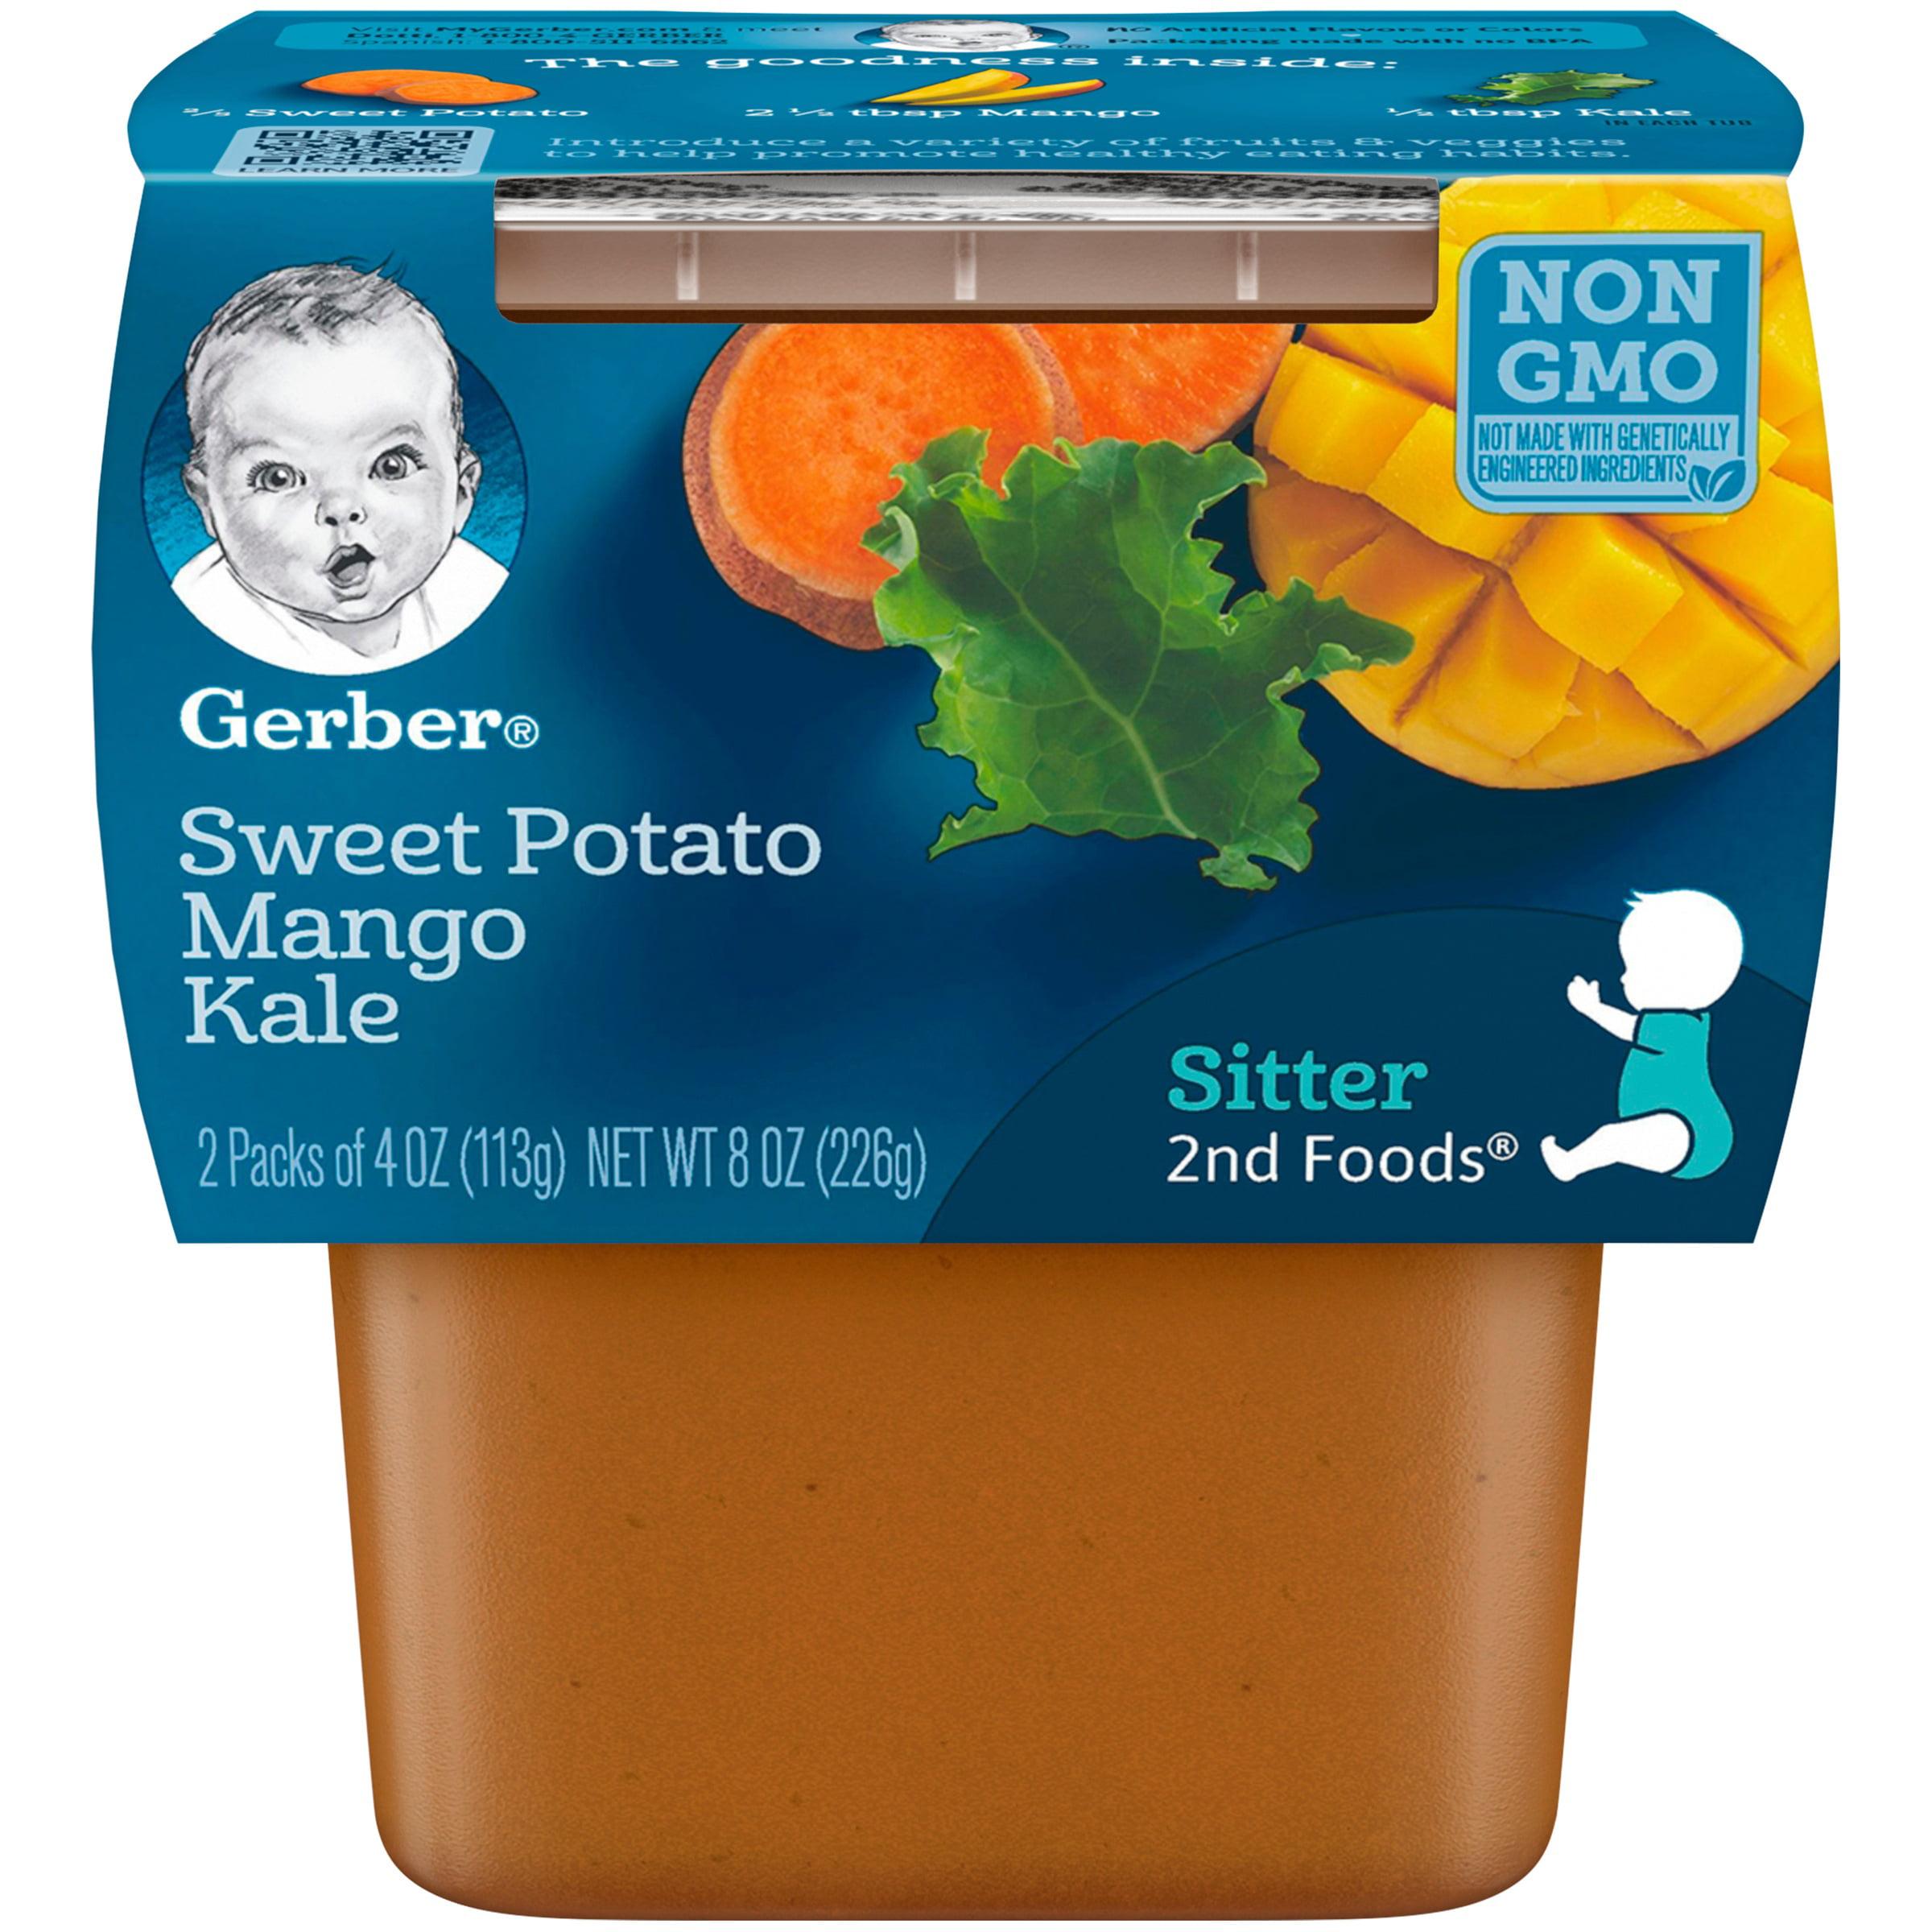 Gerber 2nd Foods Sweet Potato Mango Kale Baby Food, 6-4 oz. Tubs by Gerber